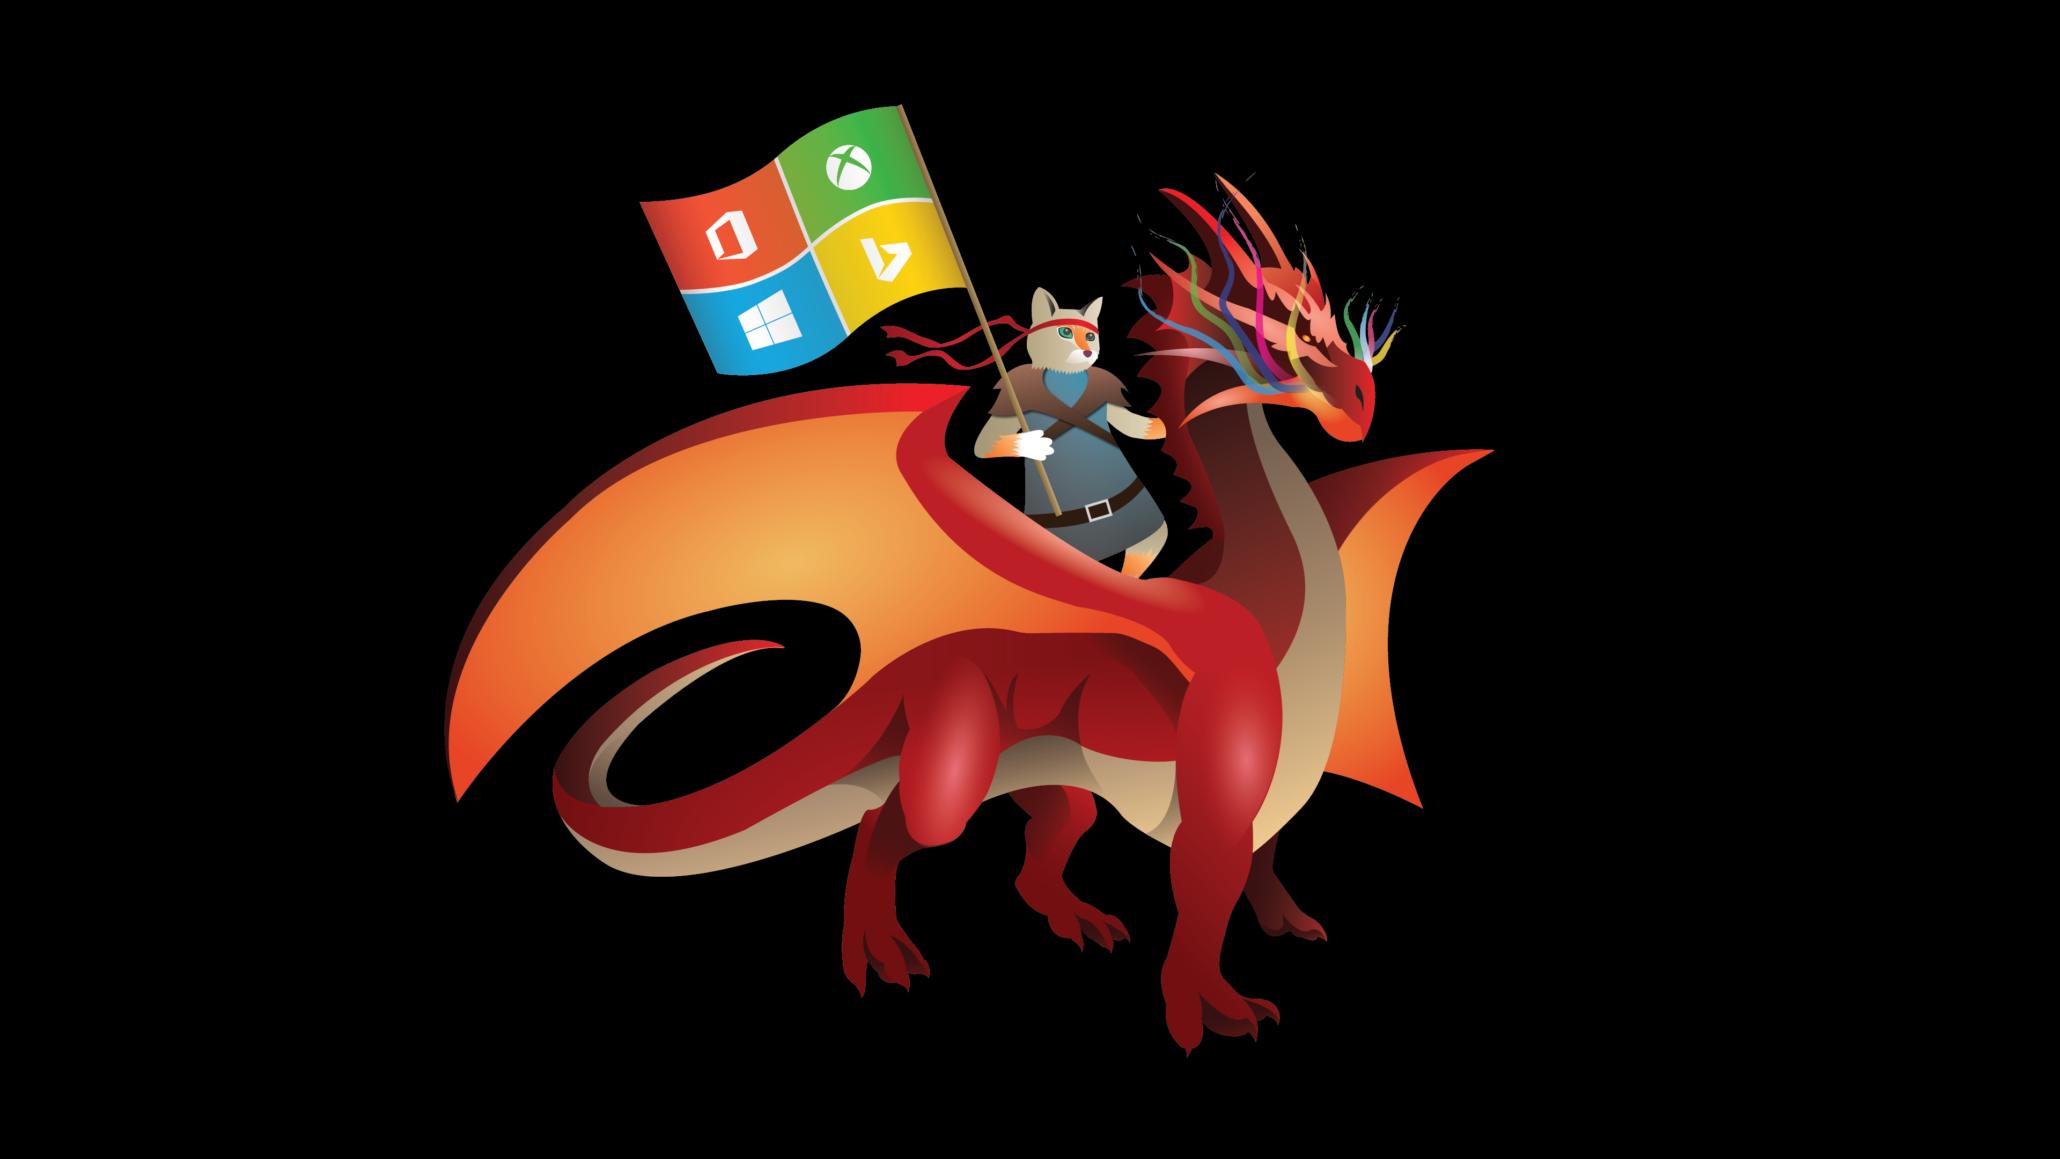 Windows 10 Wallpaper HD Im Insider By Miltonator On